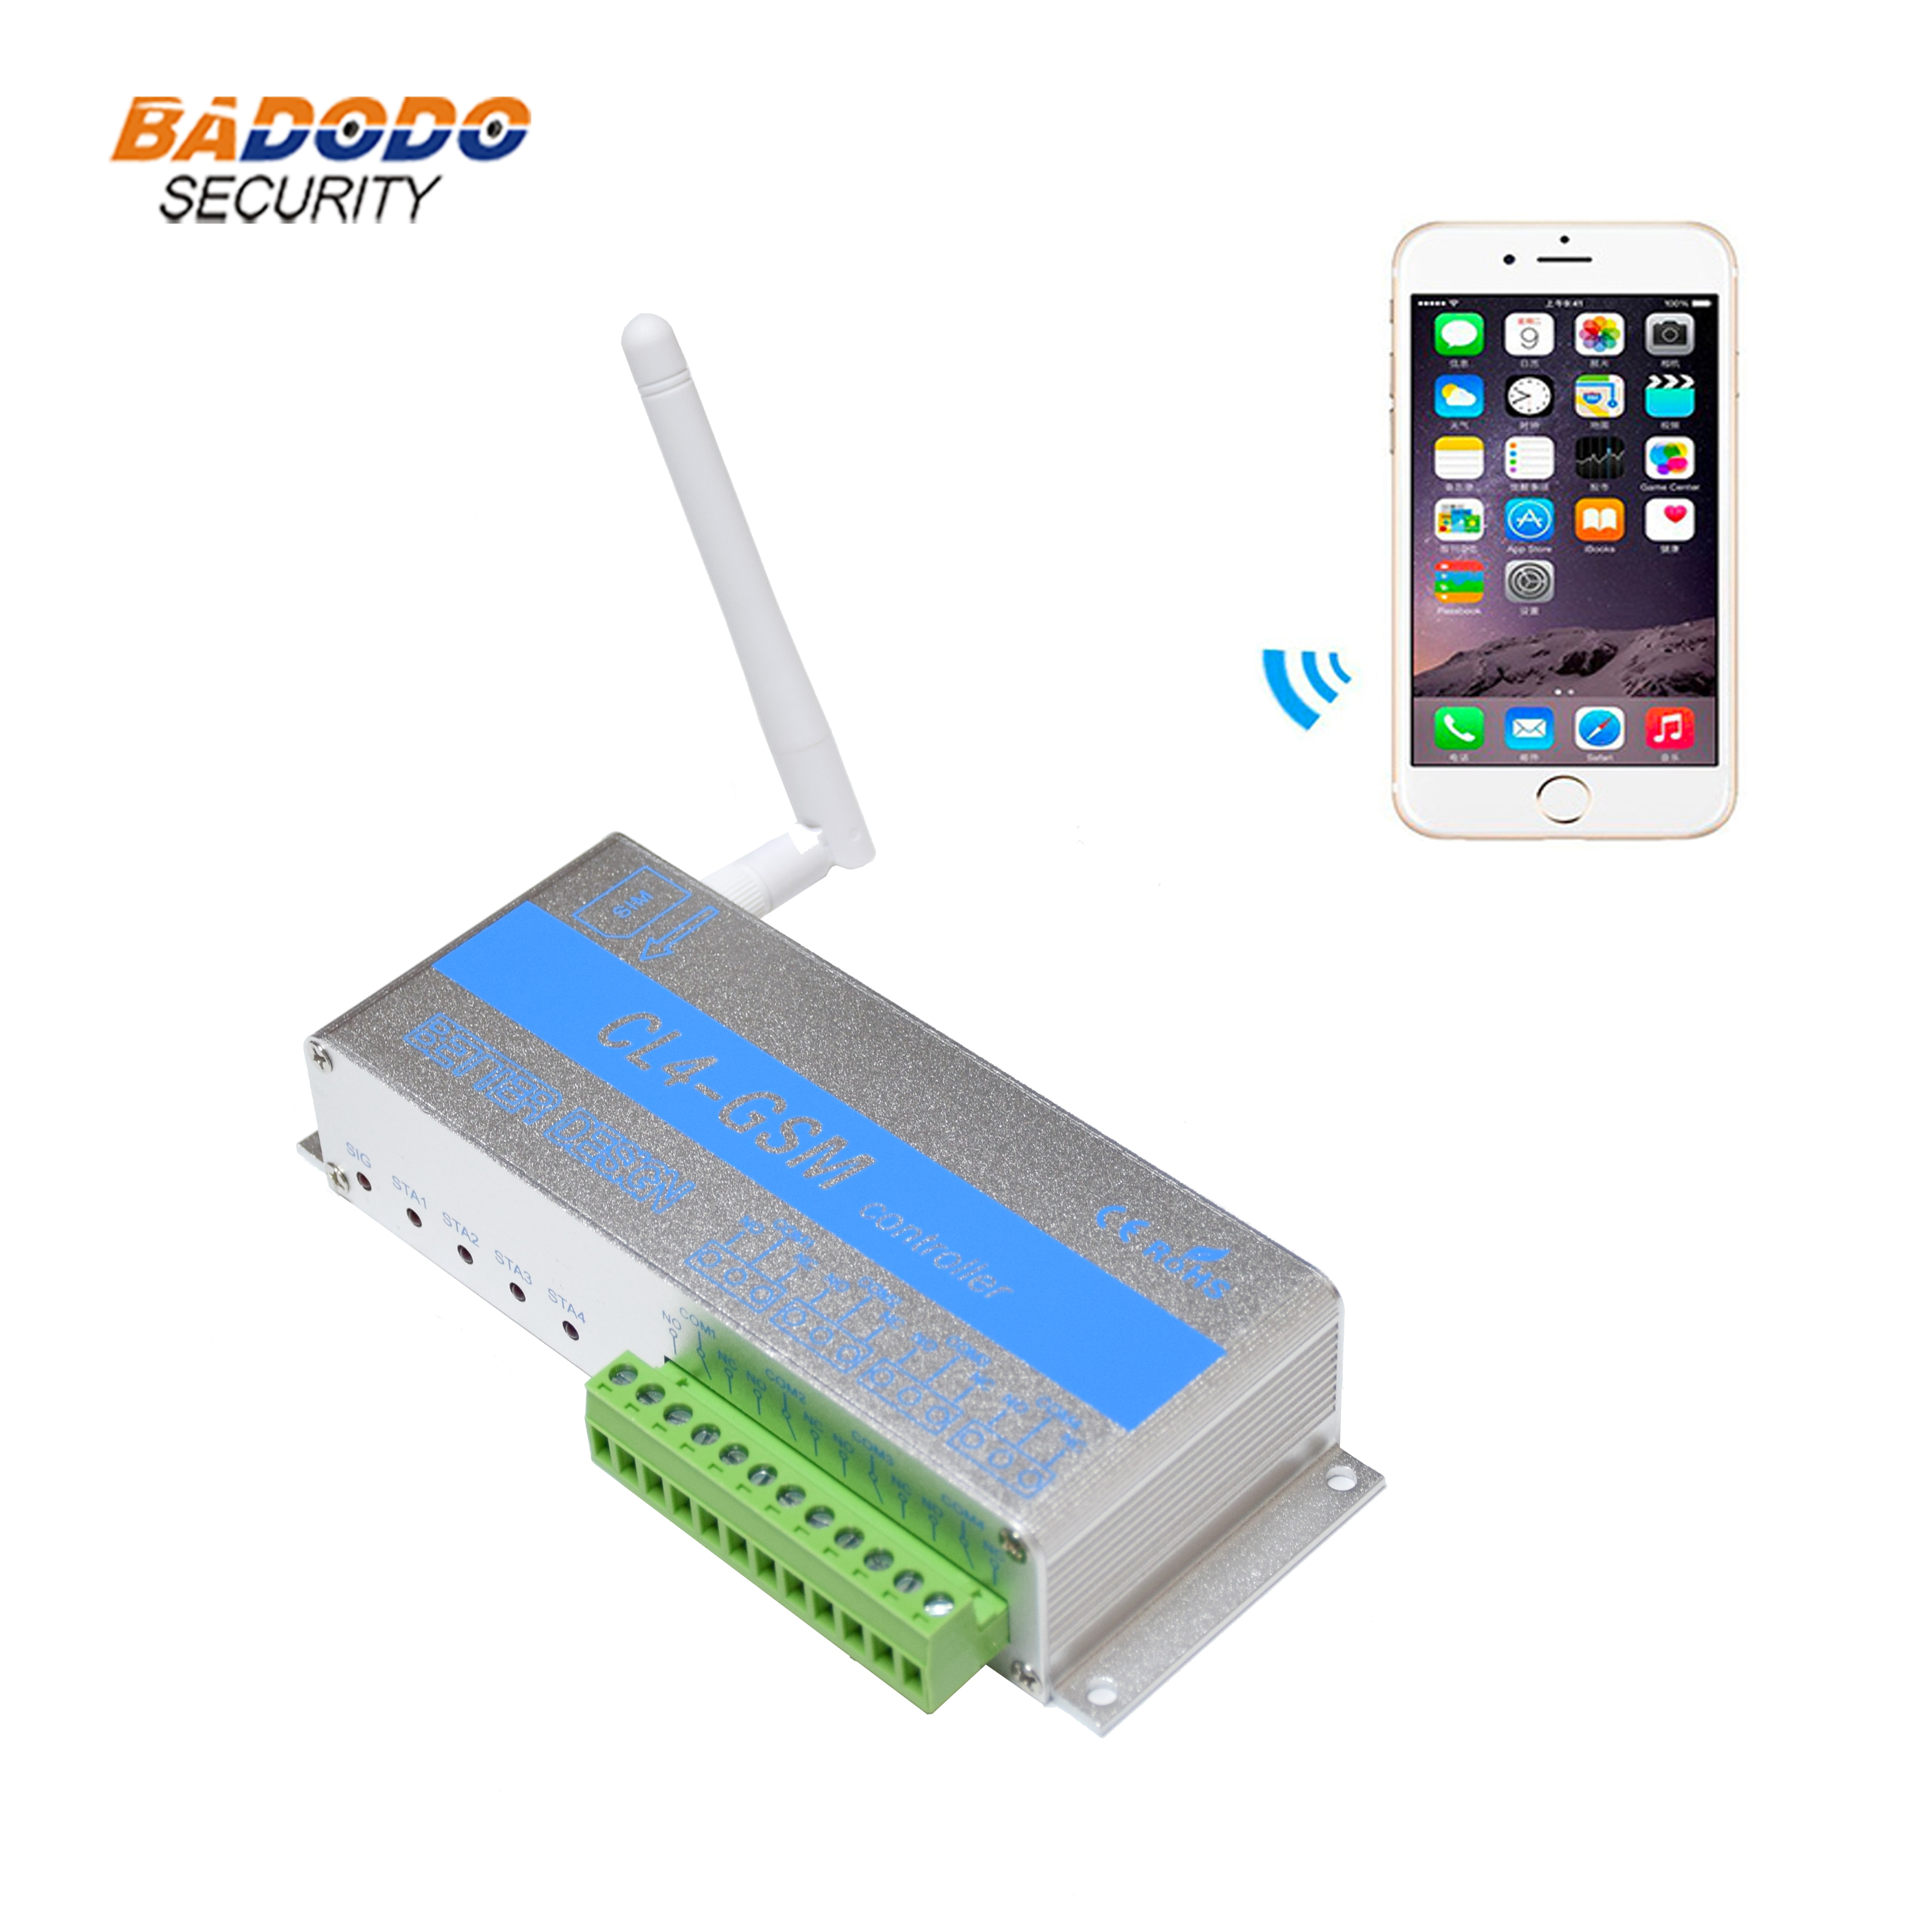 Módulo de Control Remoto GSM SMS inalámbrico CL4-GSM salida de relé de 4 vías para bloqueo eléctrico de motor de CA de alta potencia